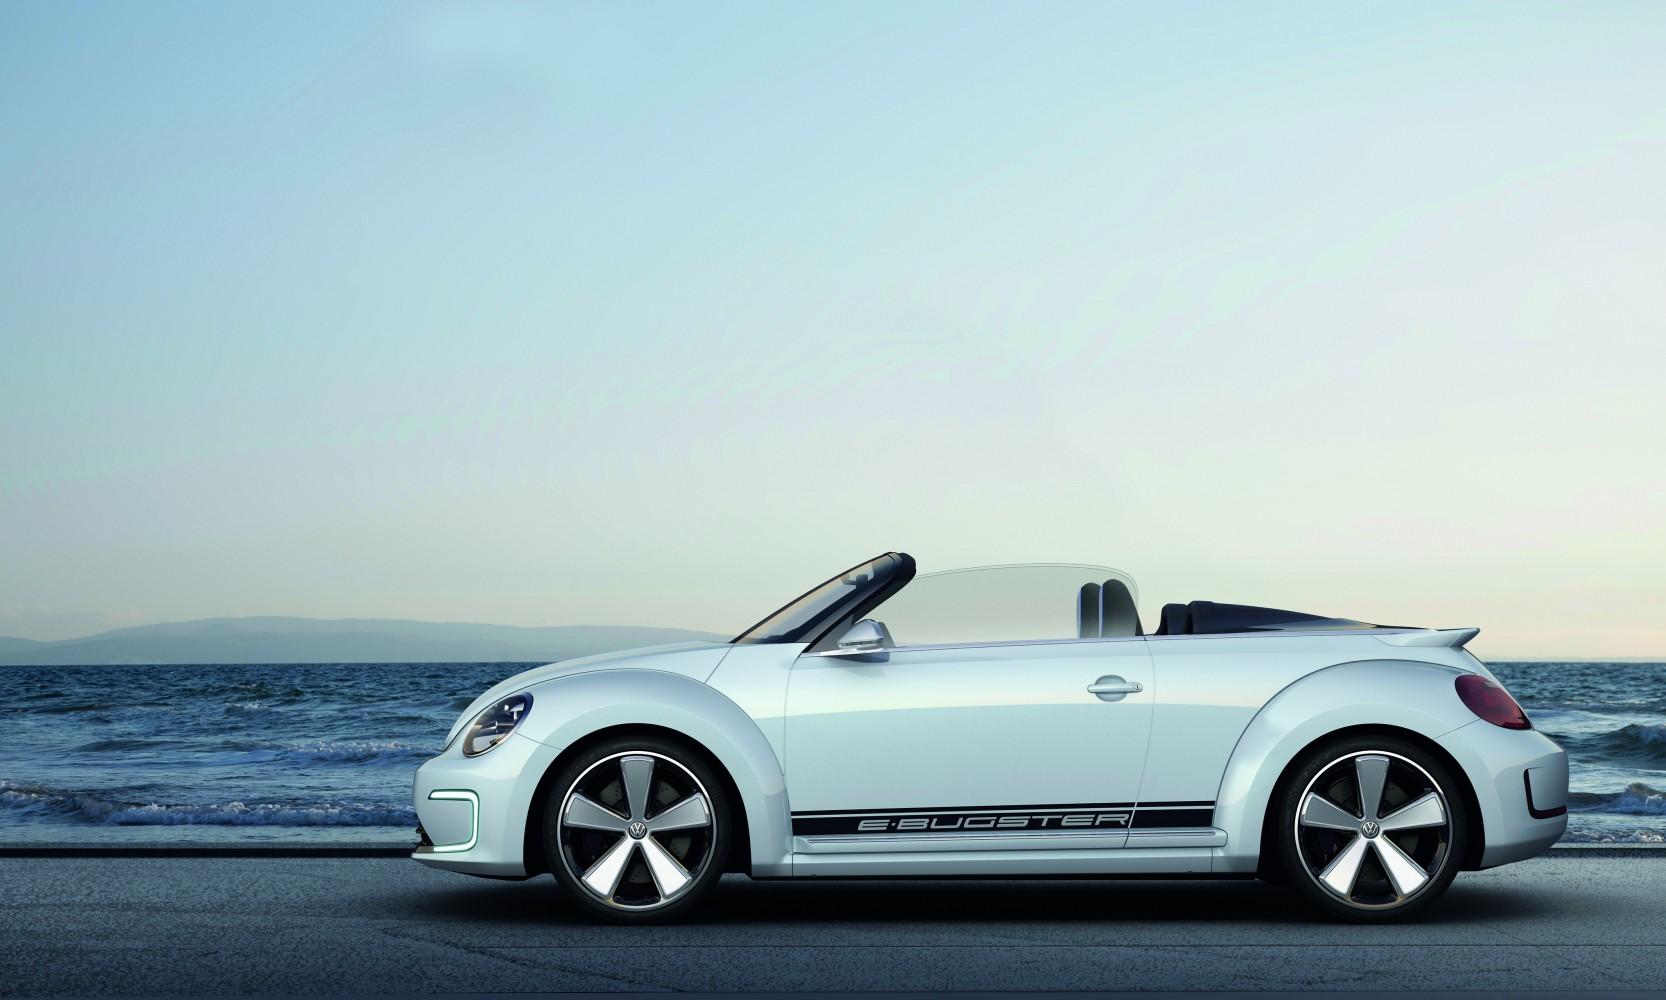 VW Beetle oben ohne – E-Bugster Peking 2012